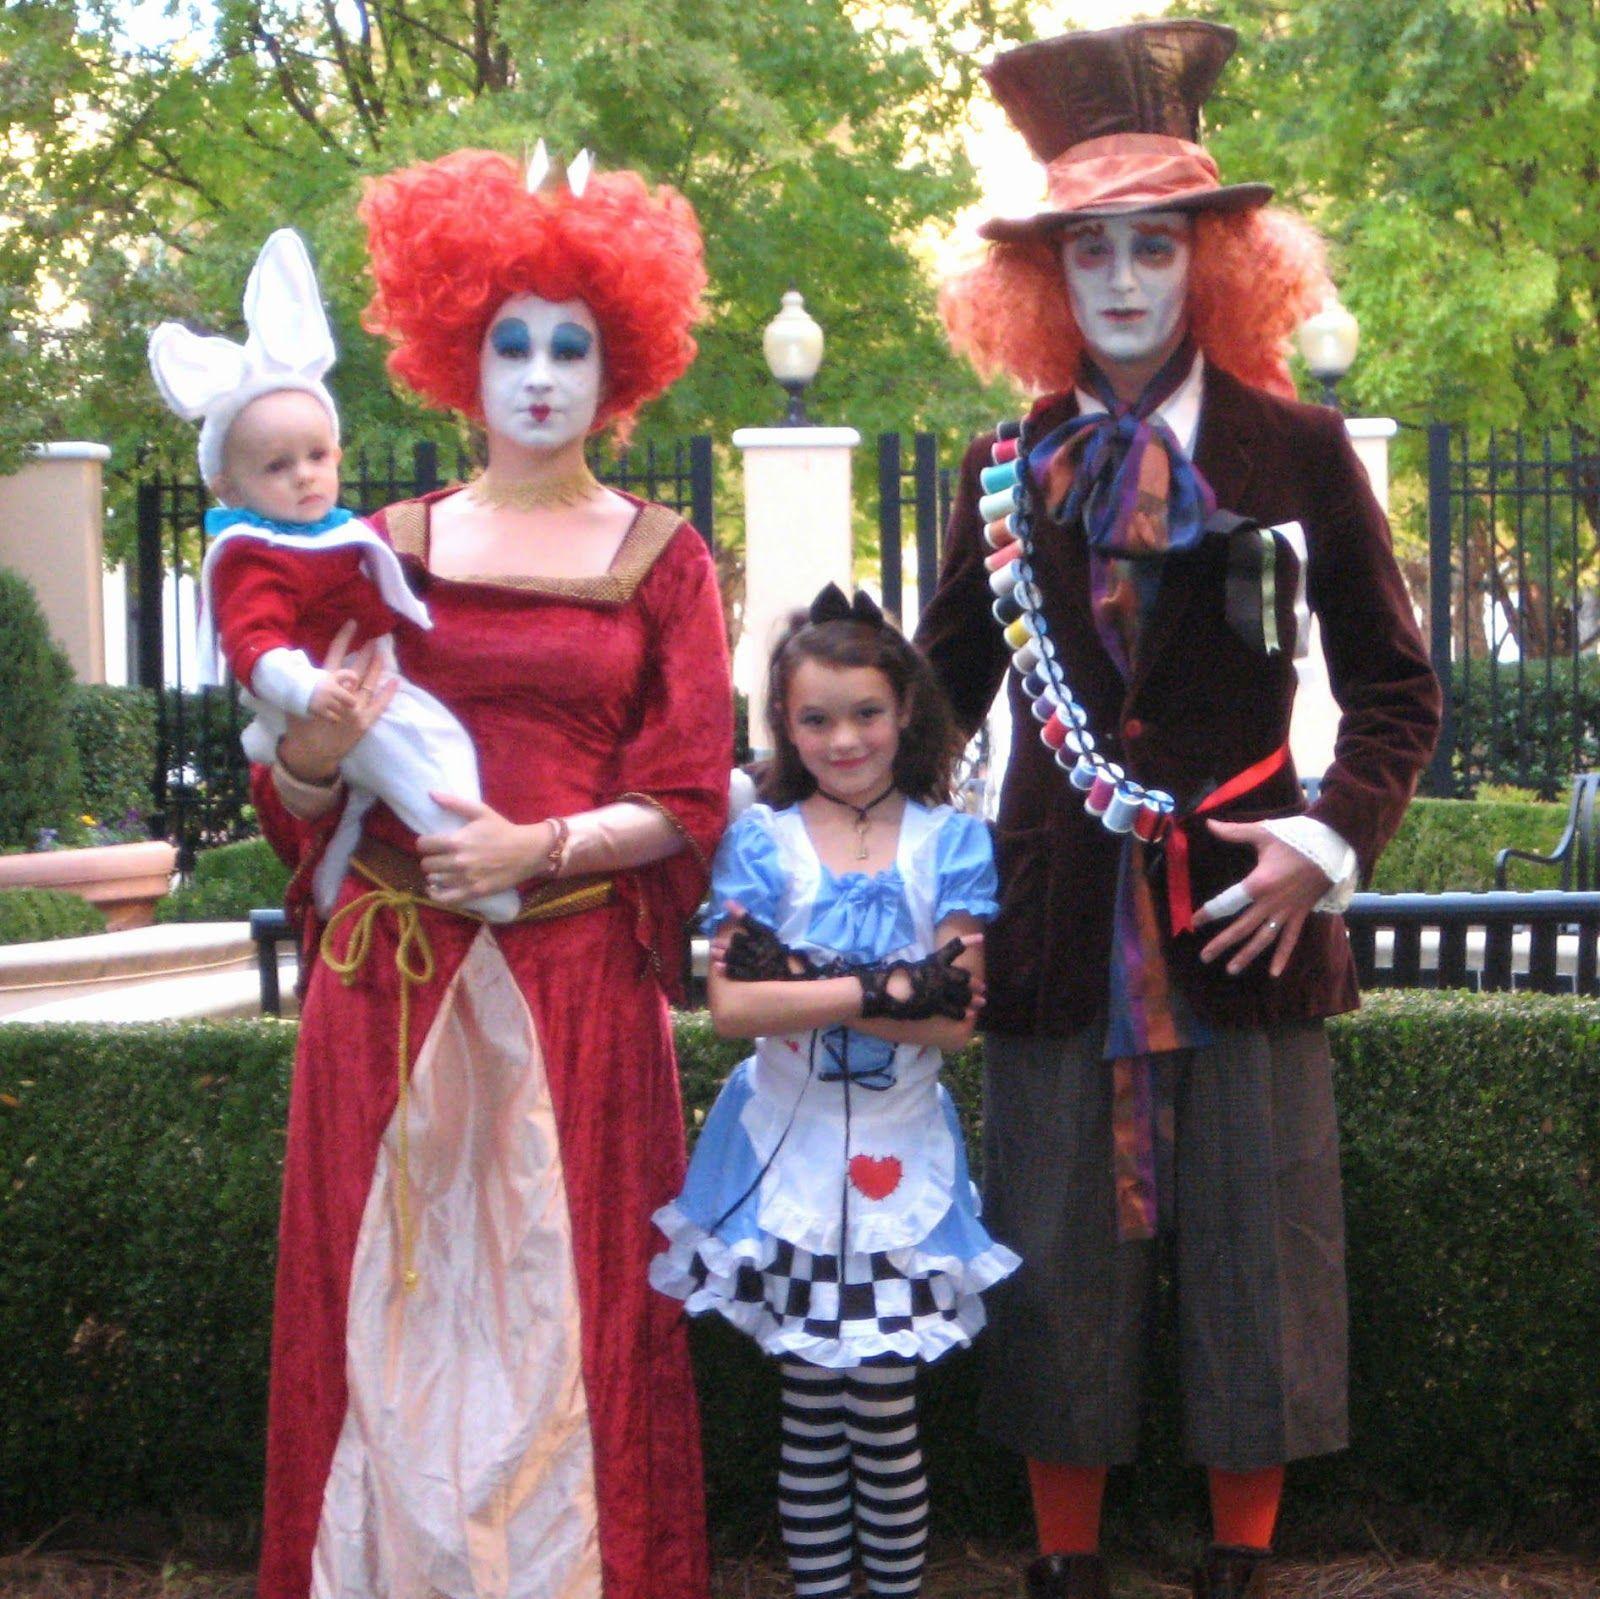 neil patrick harris, halloween - Google Search | Costume